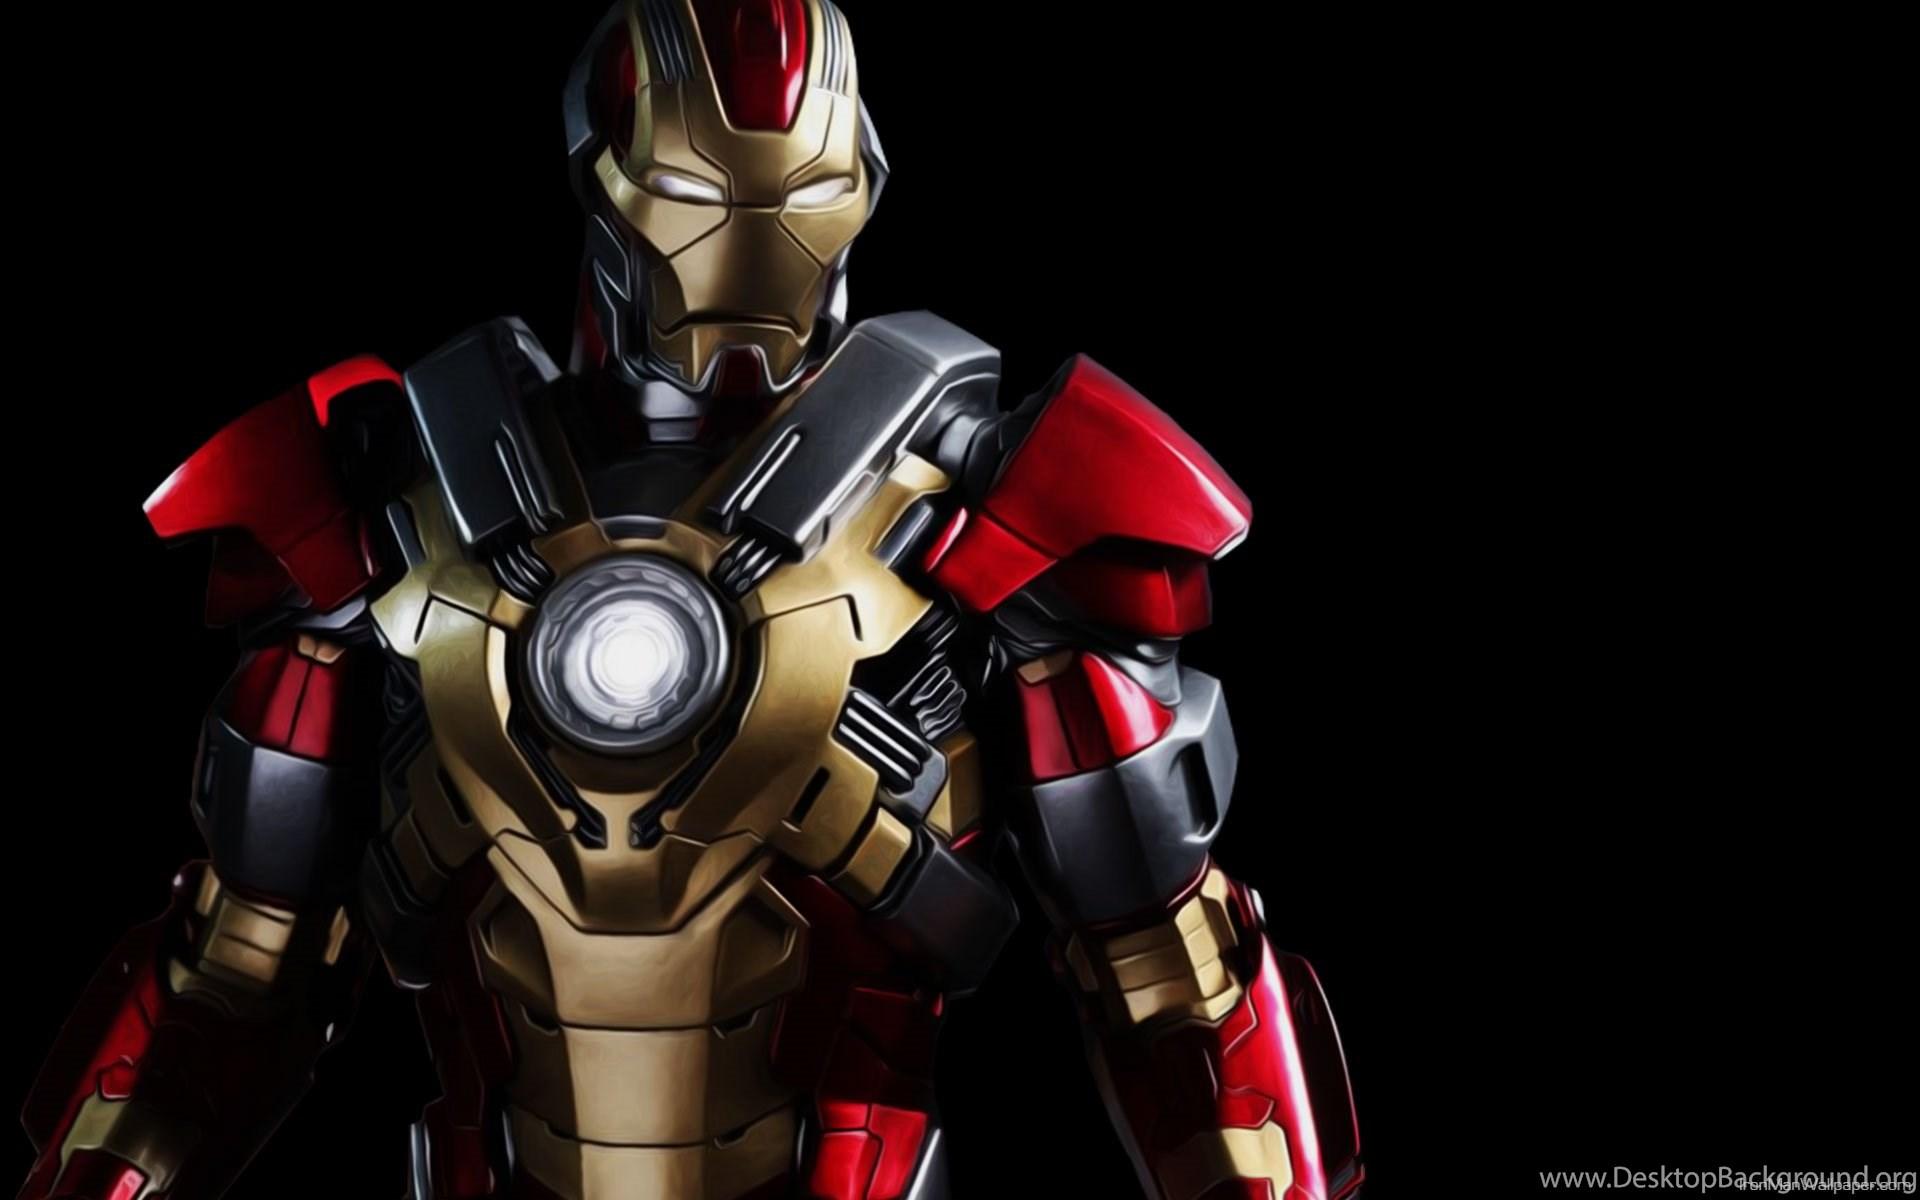 Iron Man 3 Wallpapers Full Hd Uncalke Com Desktop Background